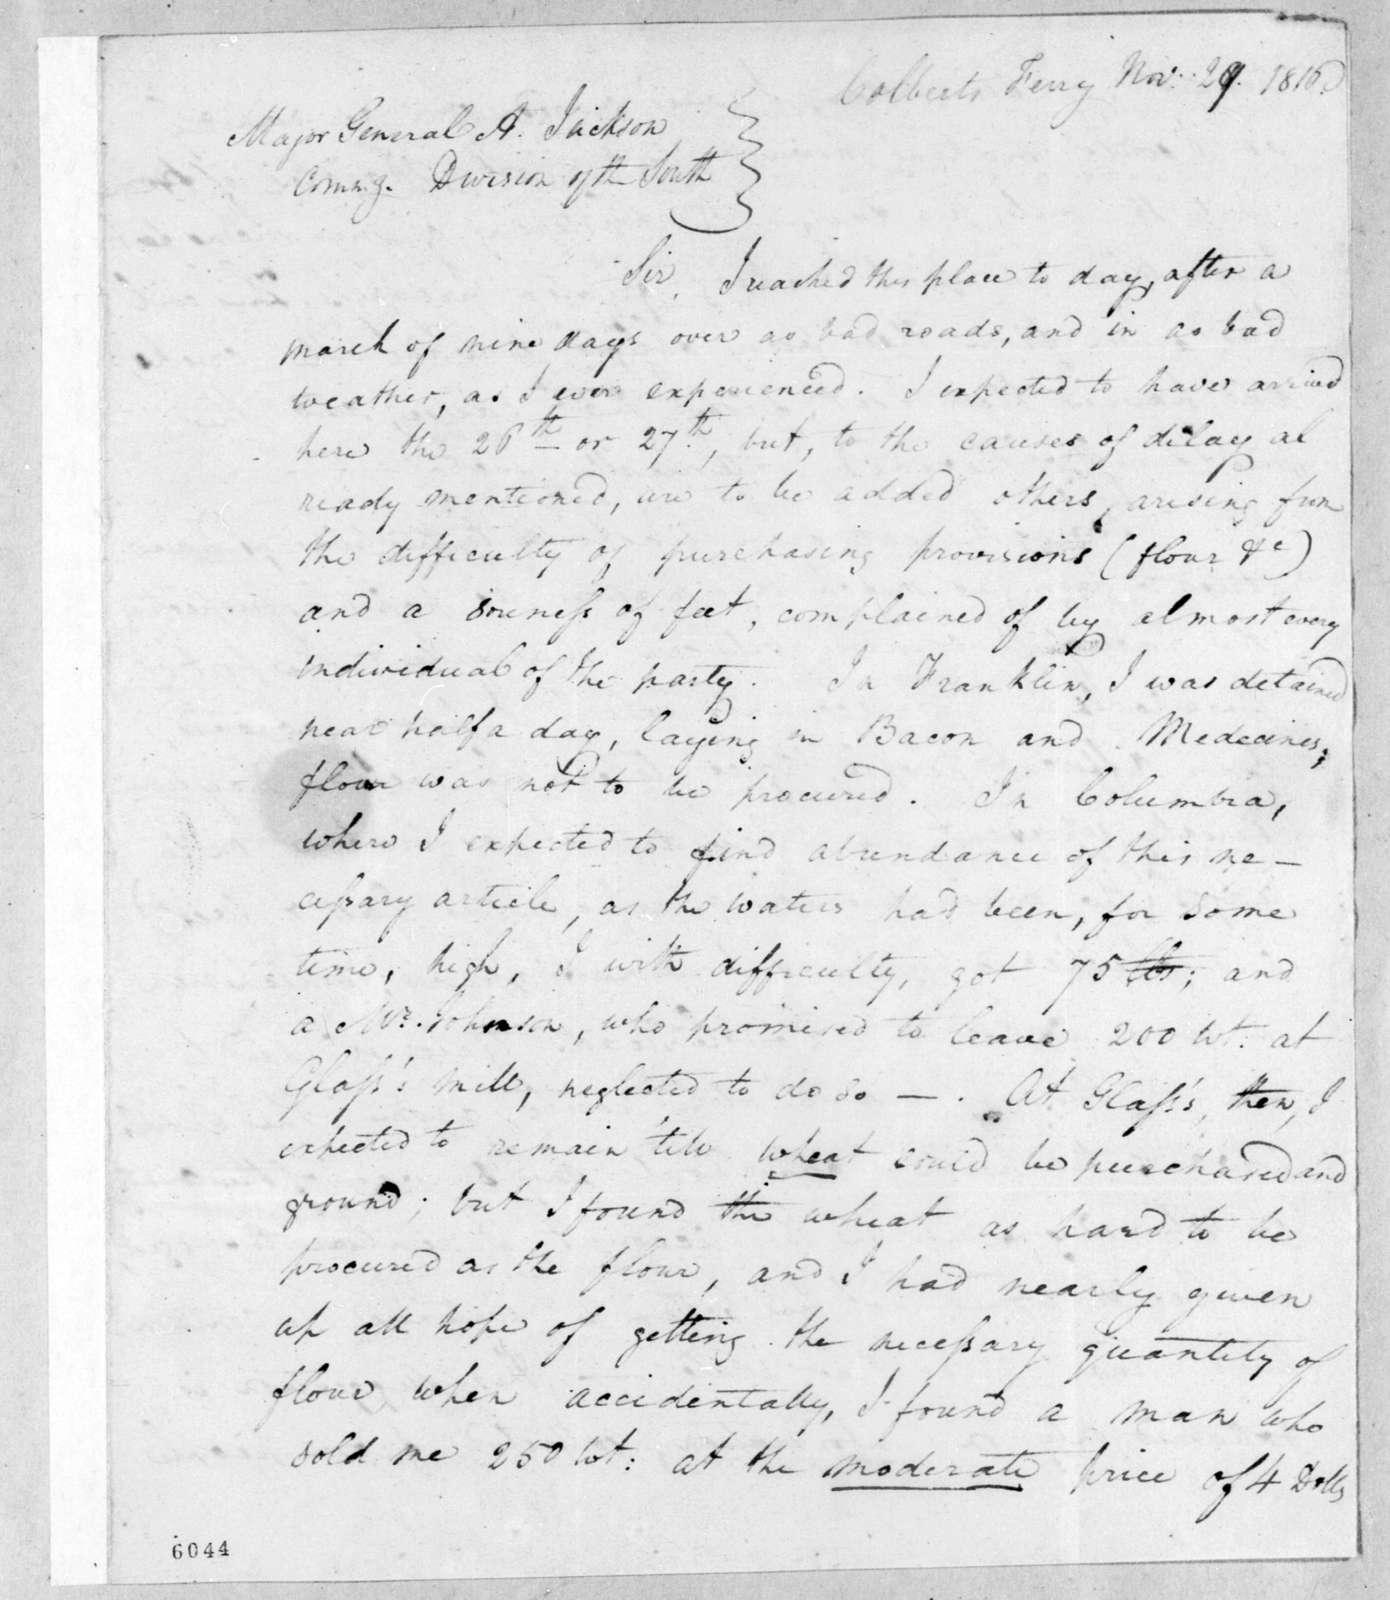 Hugh Young to Andrew Jackson, November 29, 1816